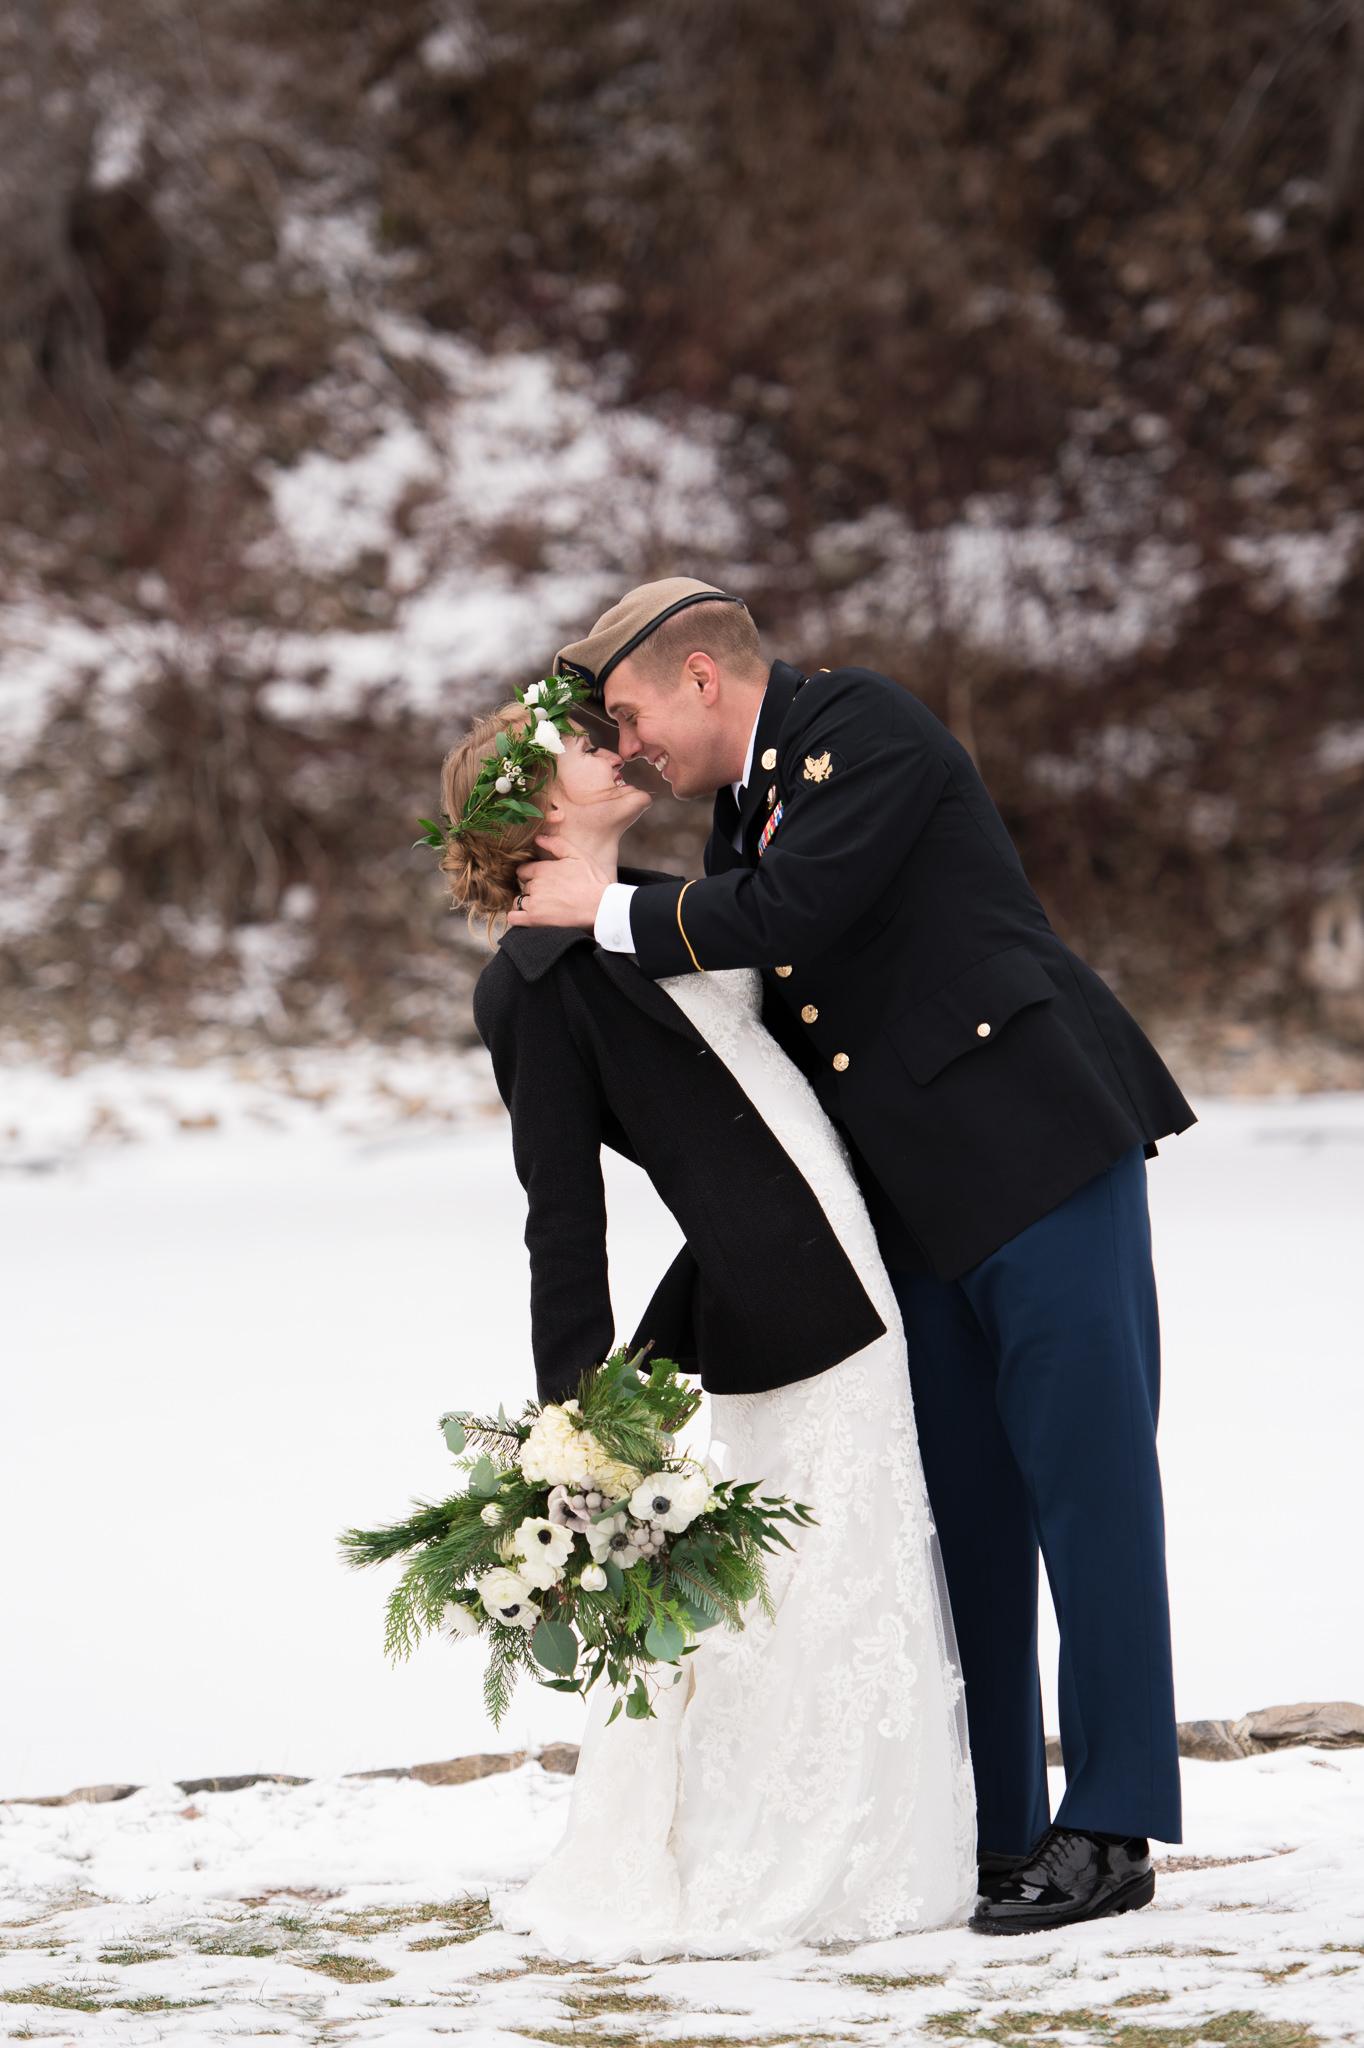 Trevor-Hooper-Wedding-Photographer-The-Bungalow-Wedding-Utah_CLR_006.jpg